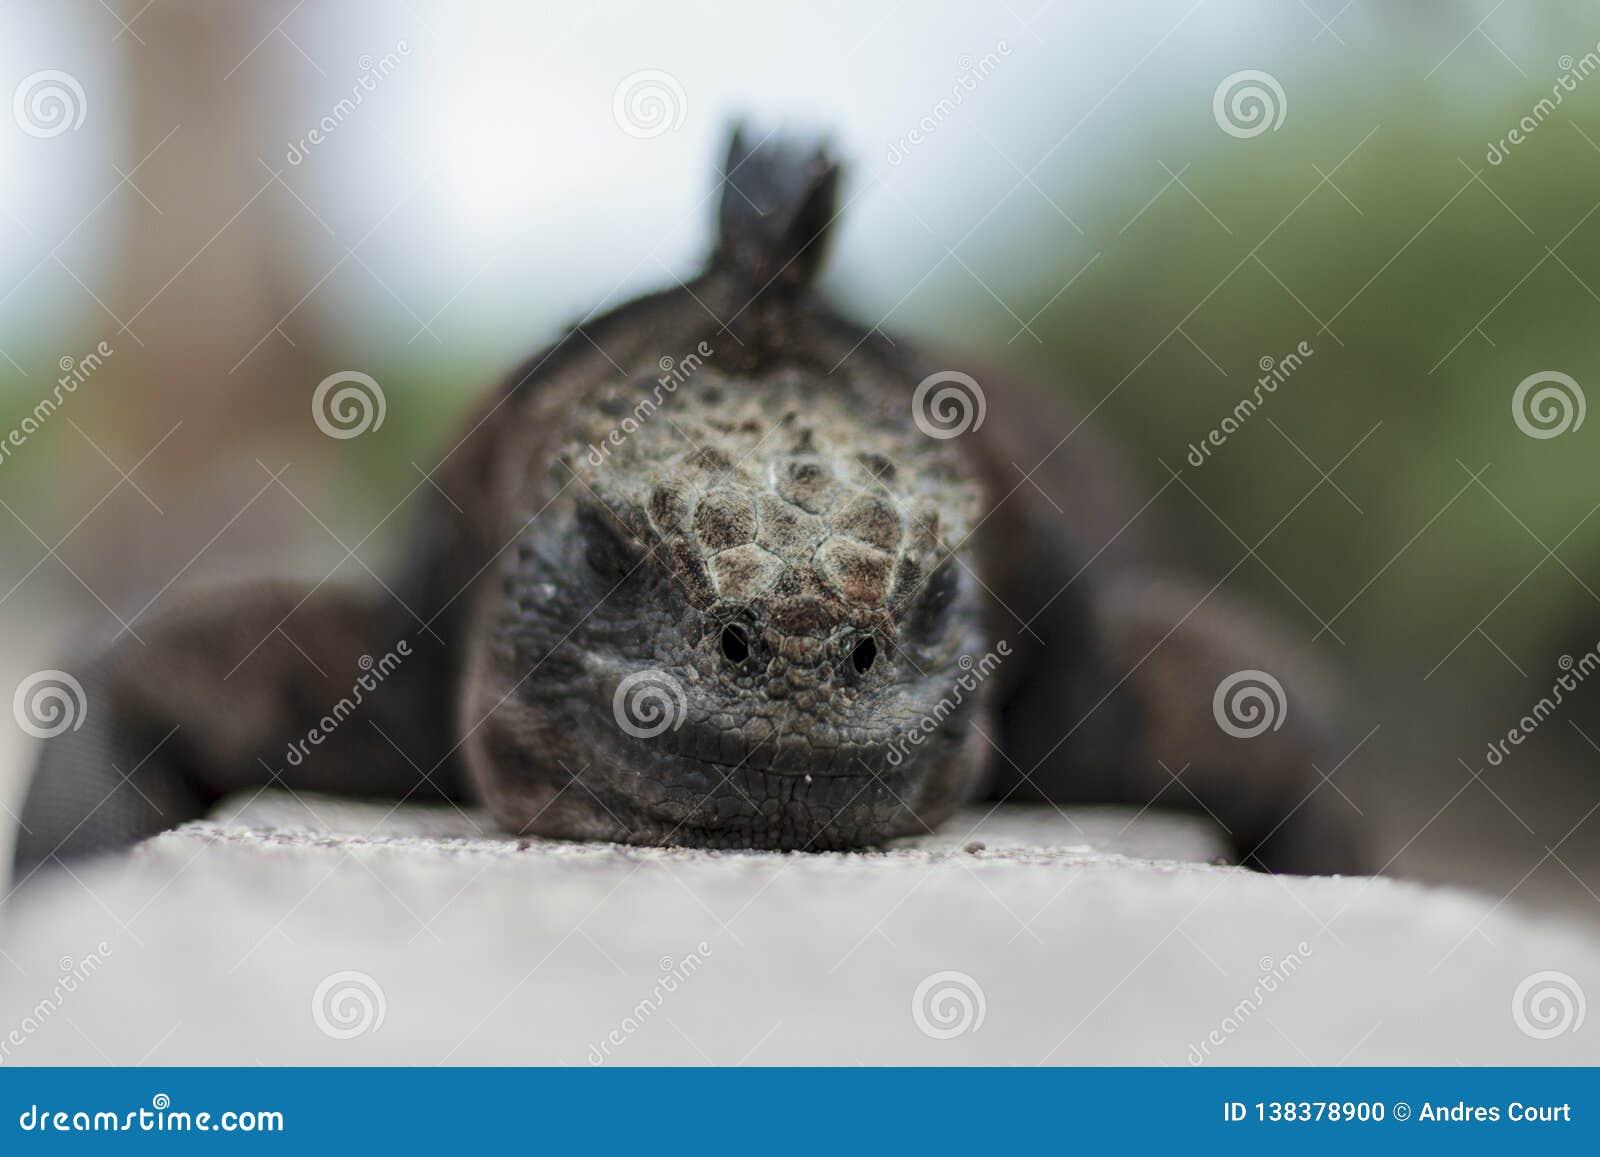 Iguana close up view